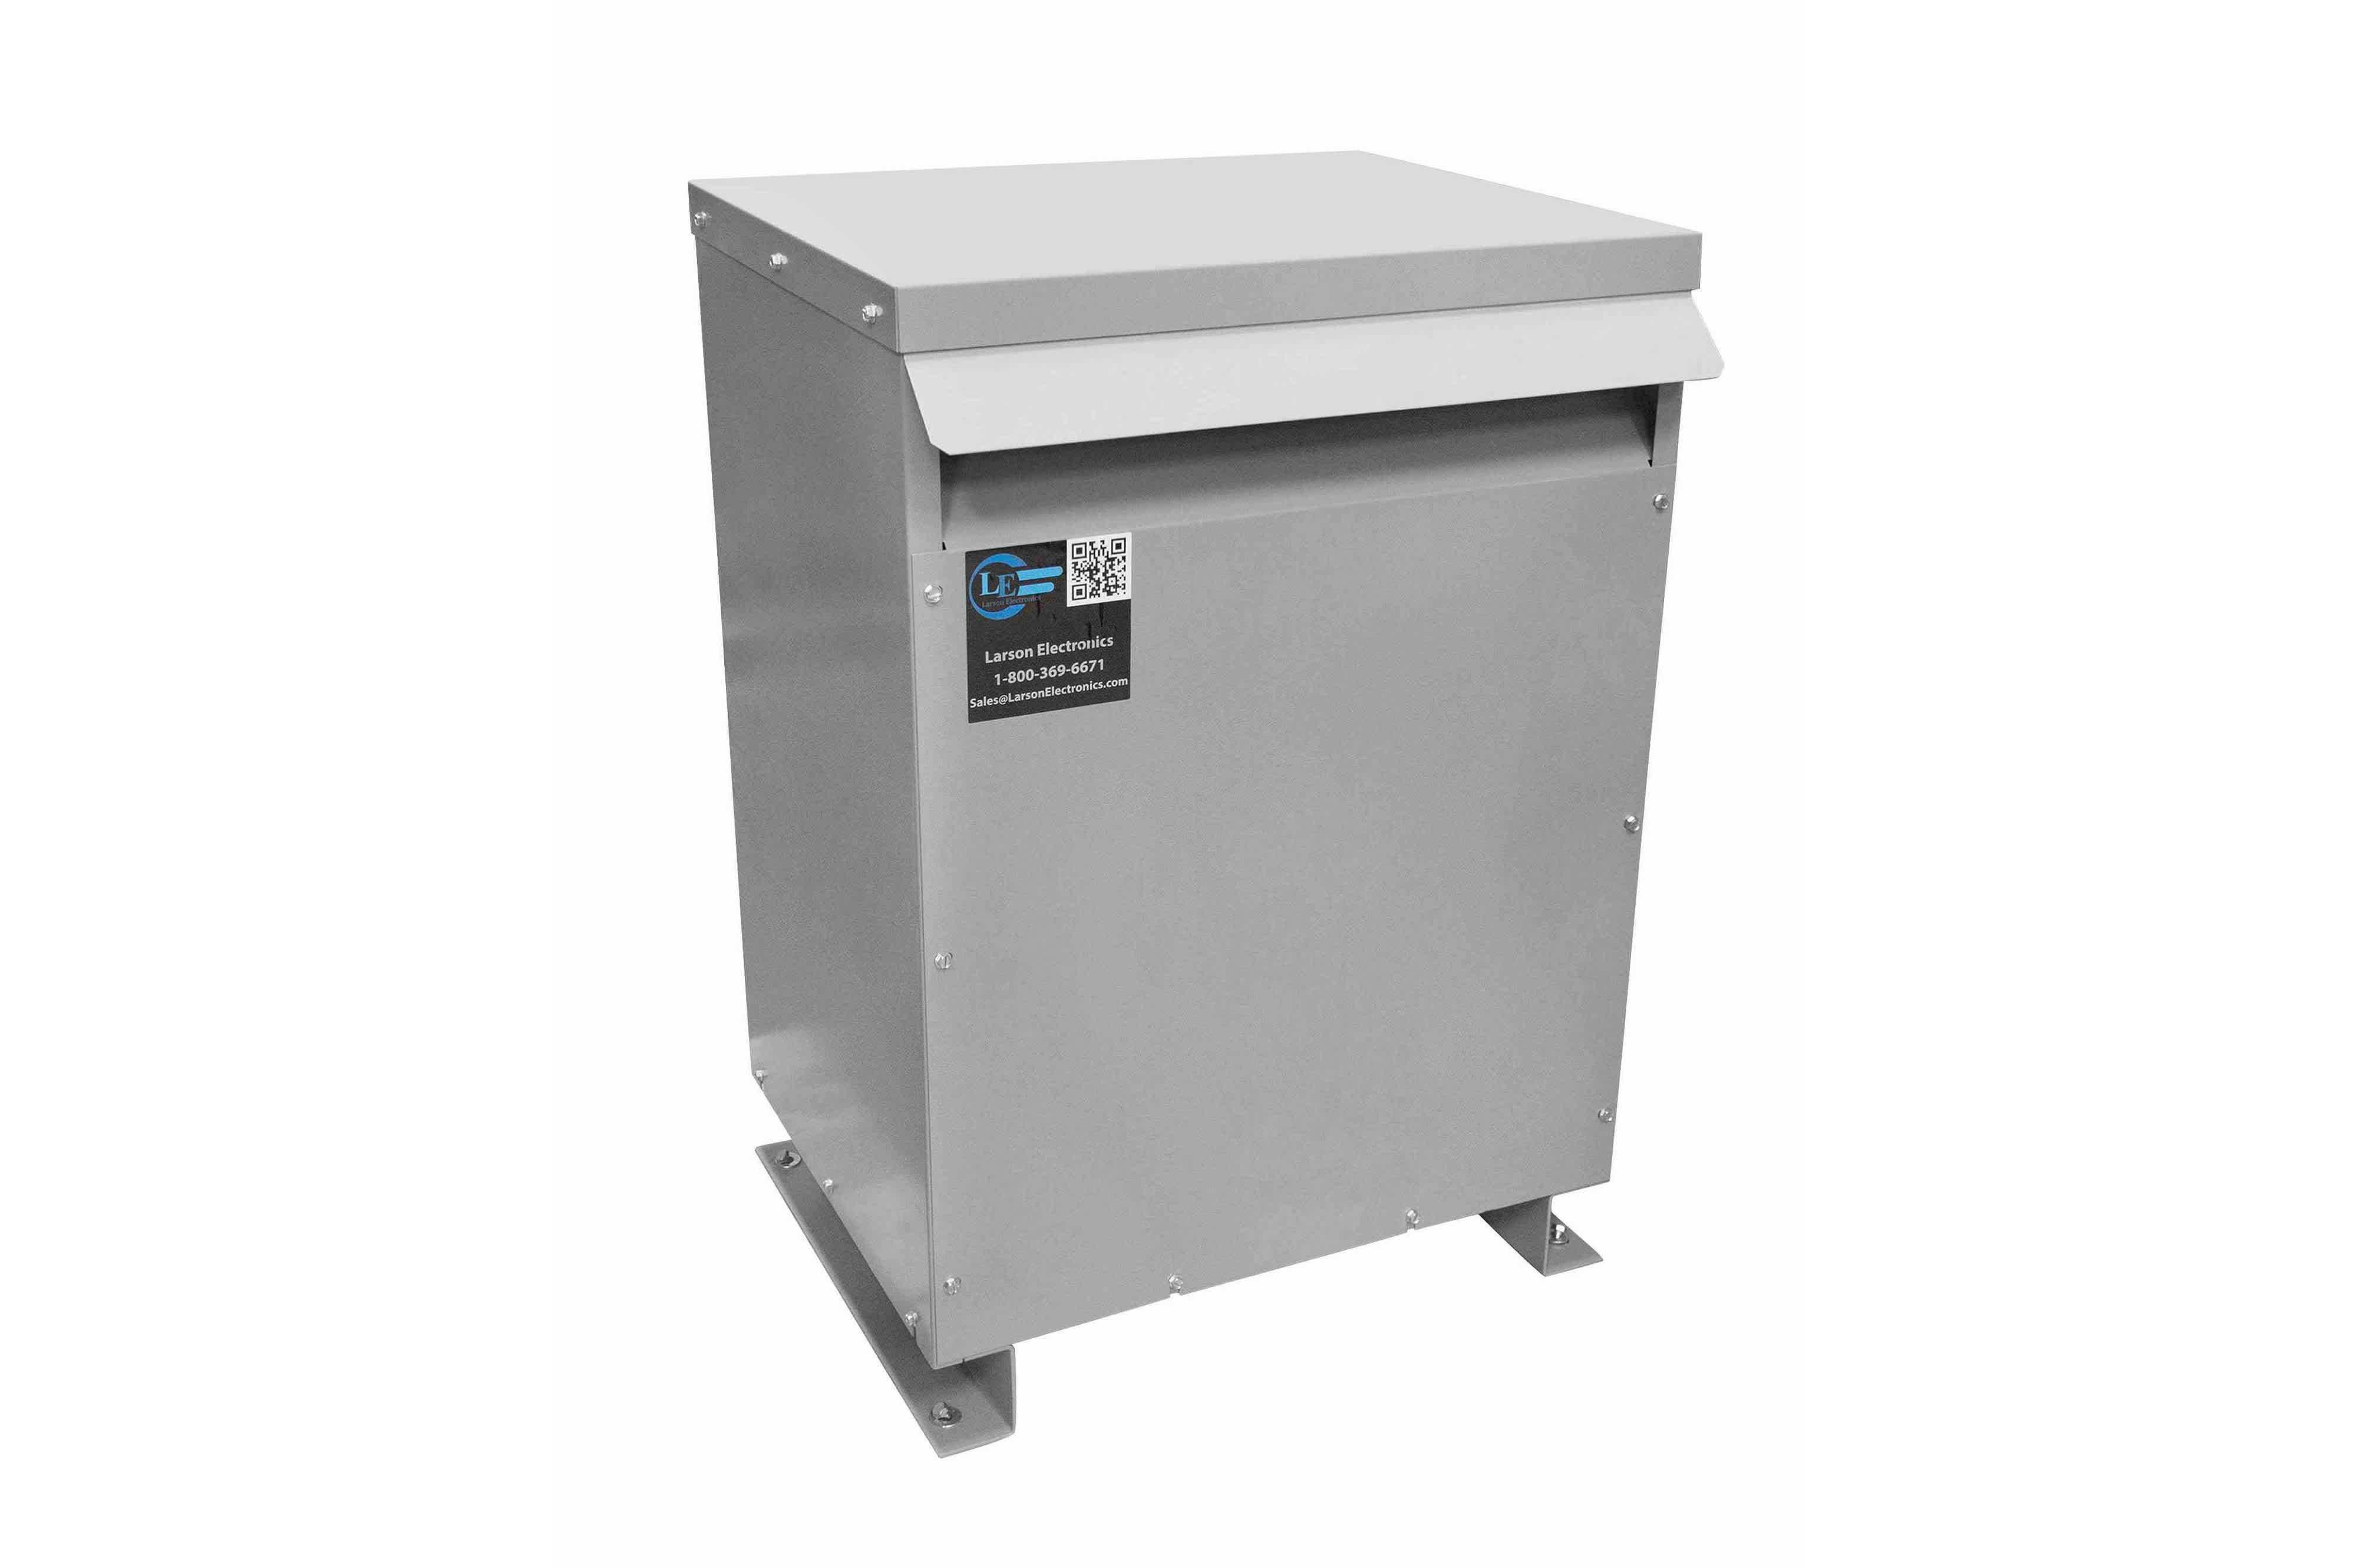 65 kVA 3PH Isolation Transformer, 415V Wye Primary, 480Y/277 Wye-N Secondary, N3R, Ventilated, 60 Hz